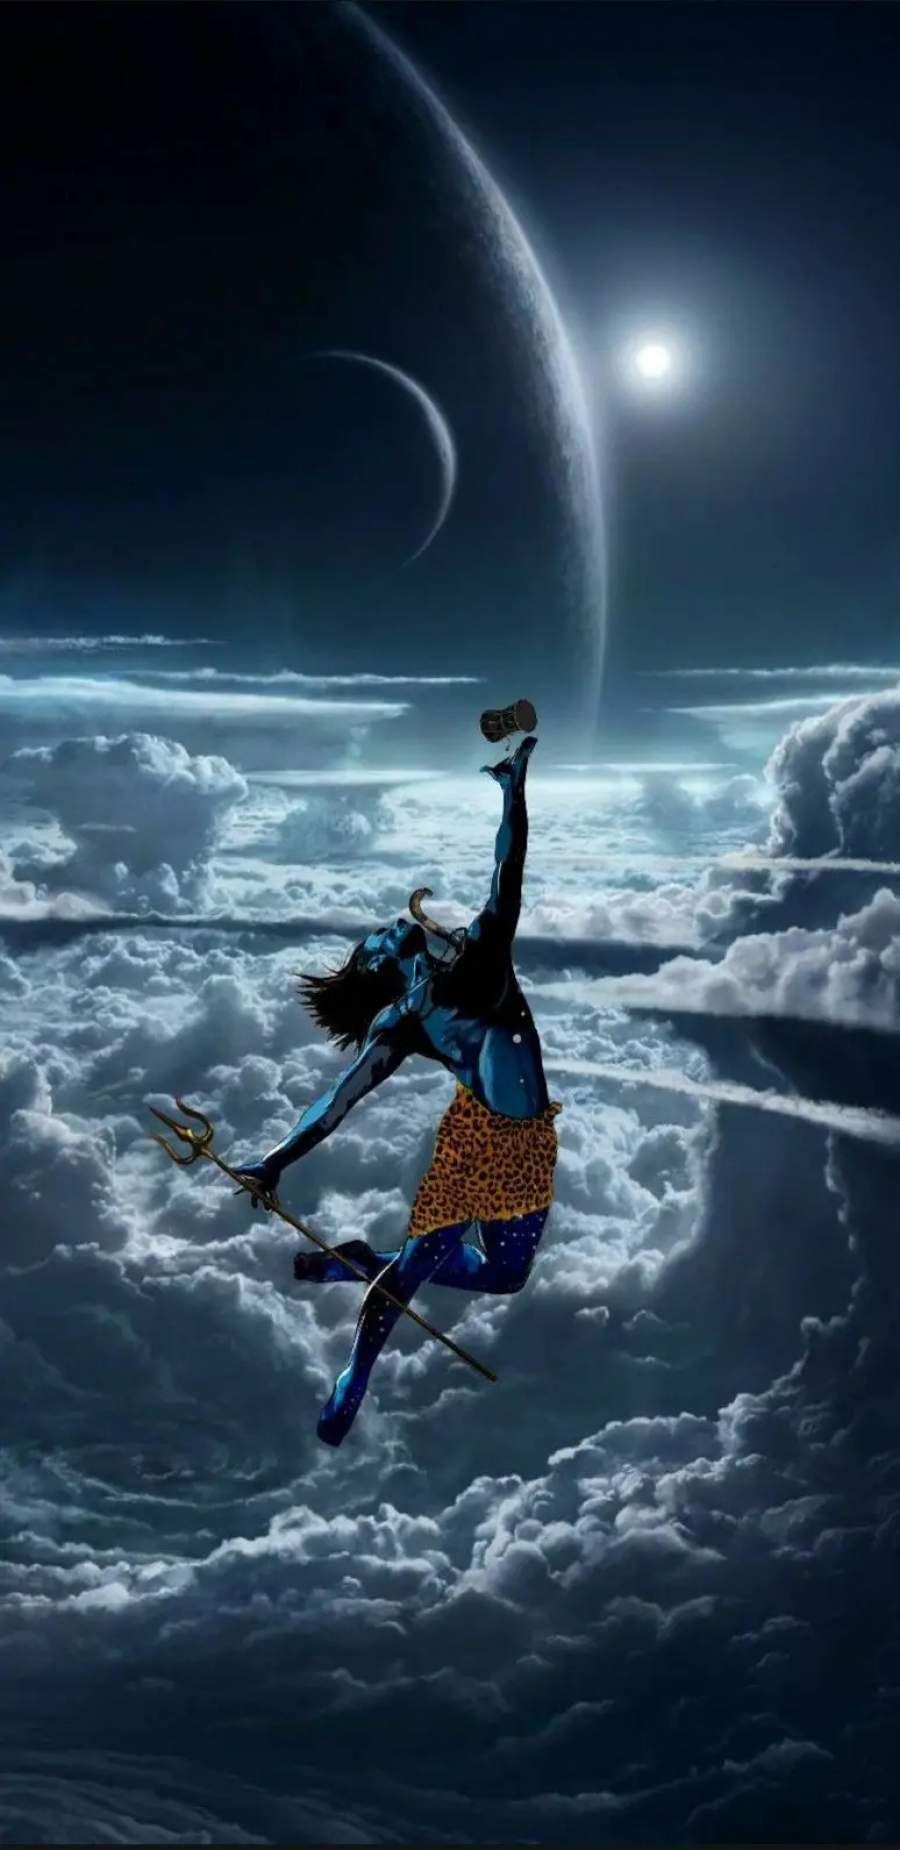 Lord Shiva Mahadev Iphone Wallpaper In 2020 Lord Shiva Hd Wallpaper Lord Shiva Hd Images Shiva Wallpaper